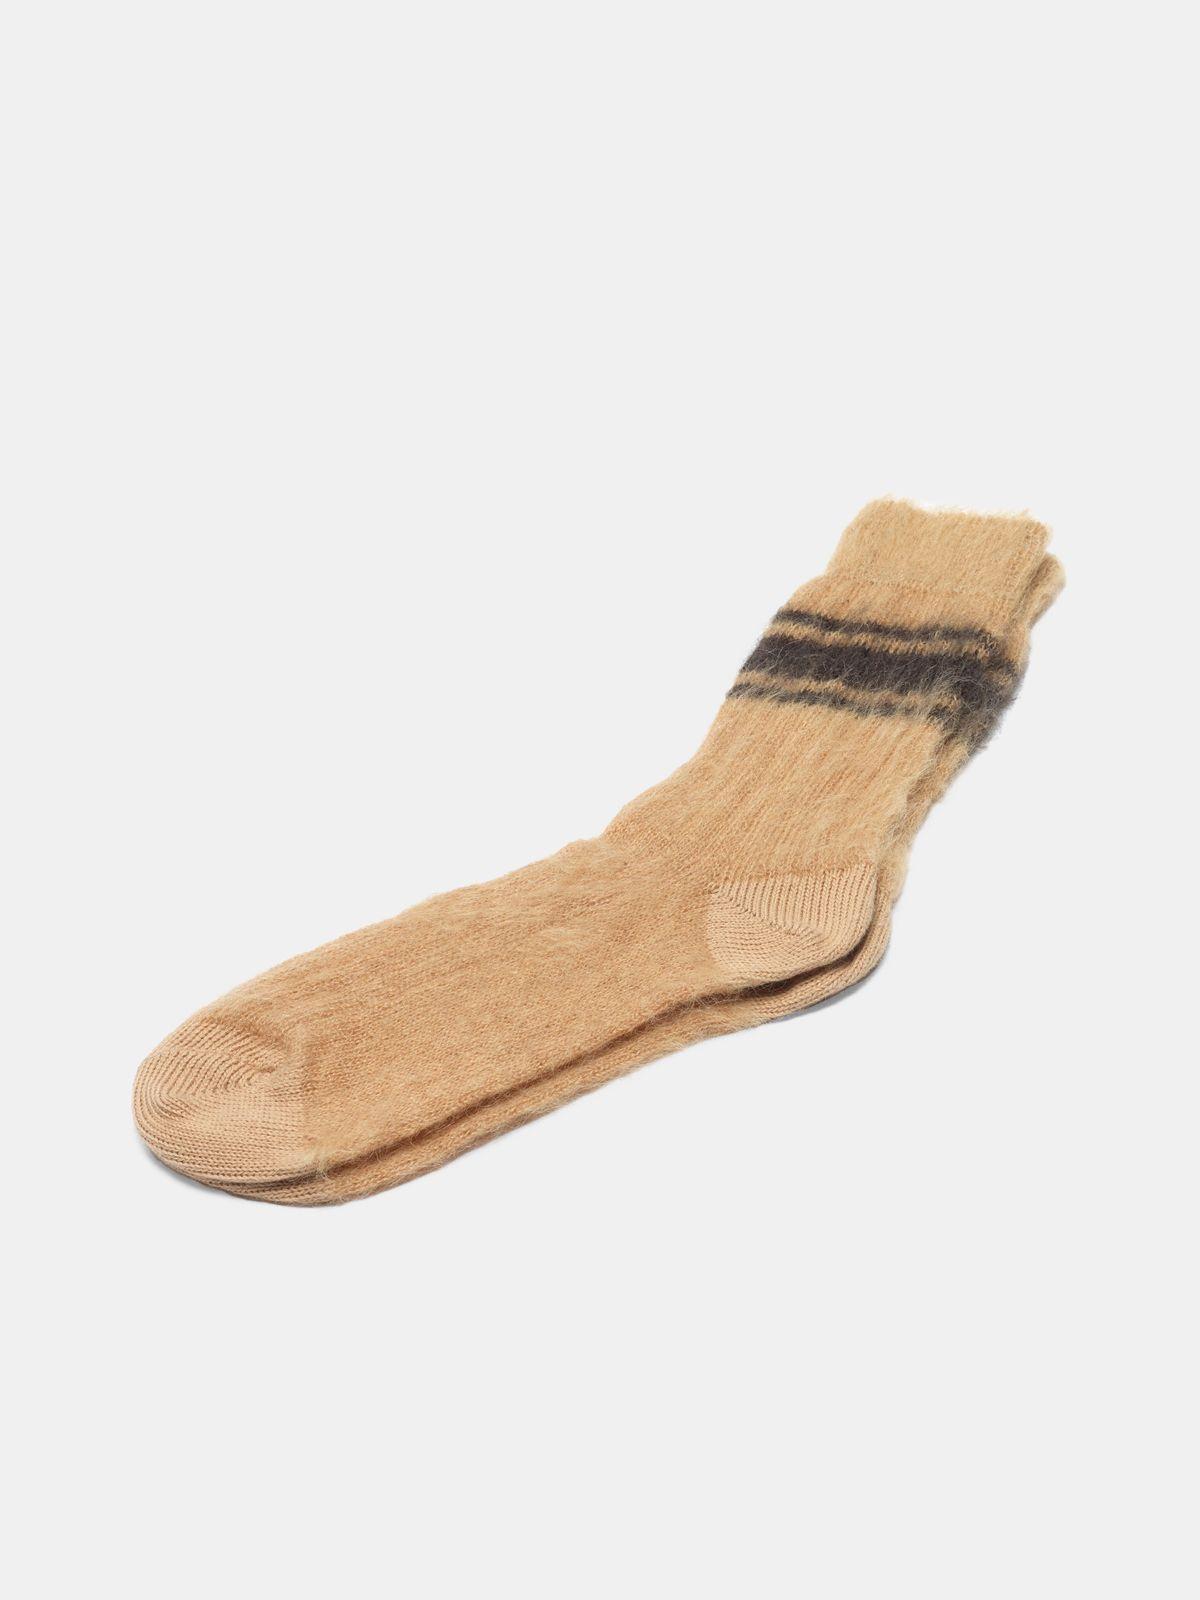 Golden Goose - Tsutsuji socks made of brushed mohair wool in